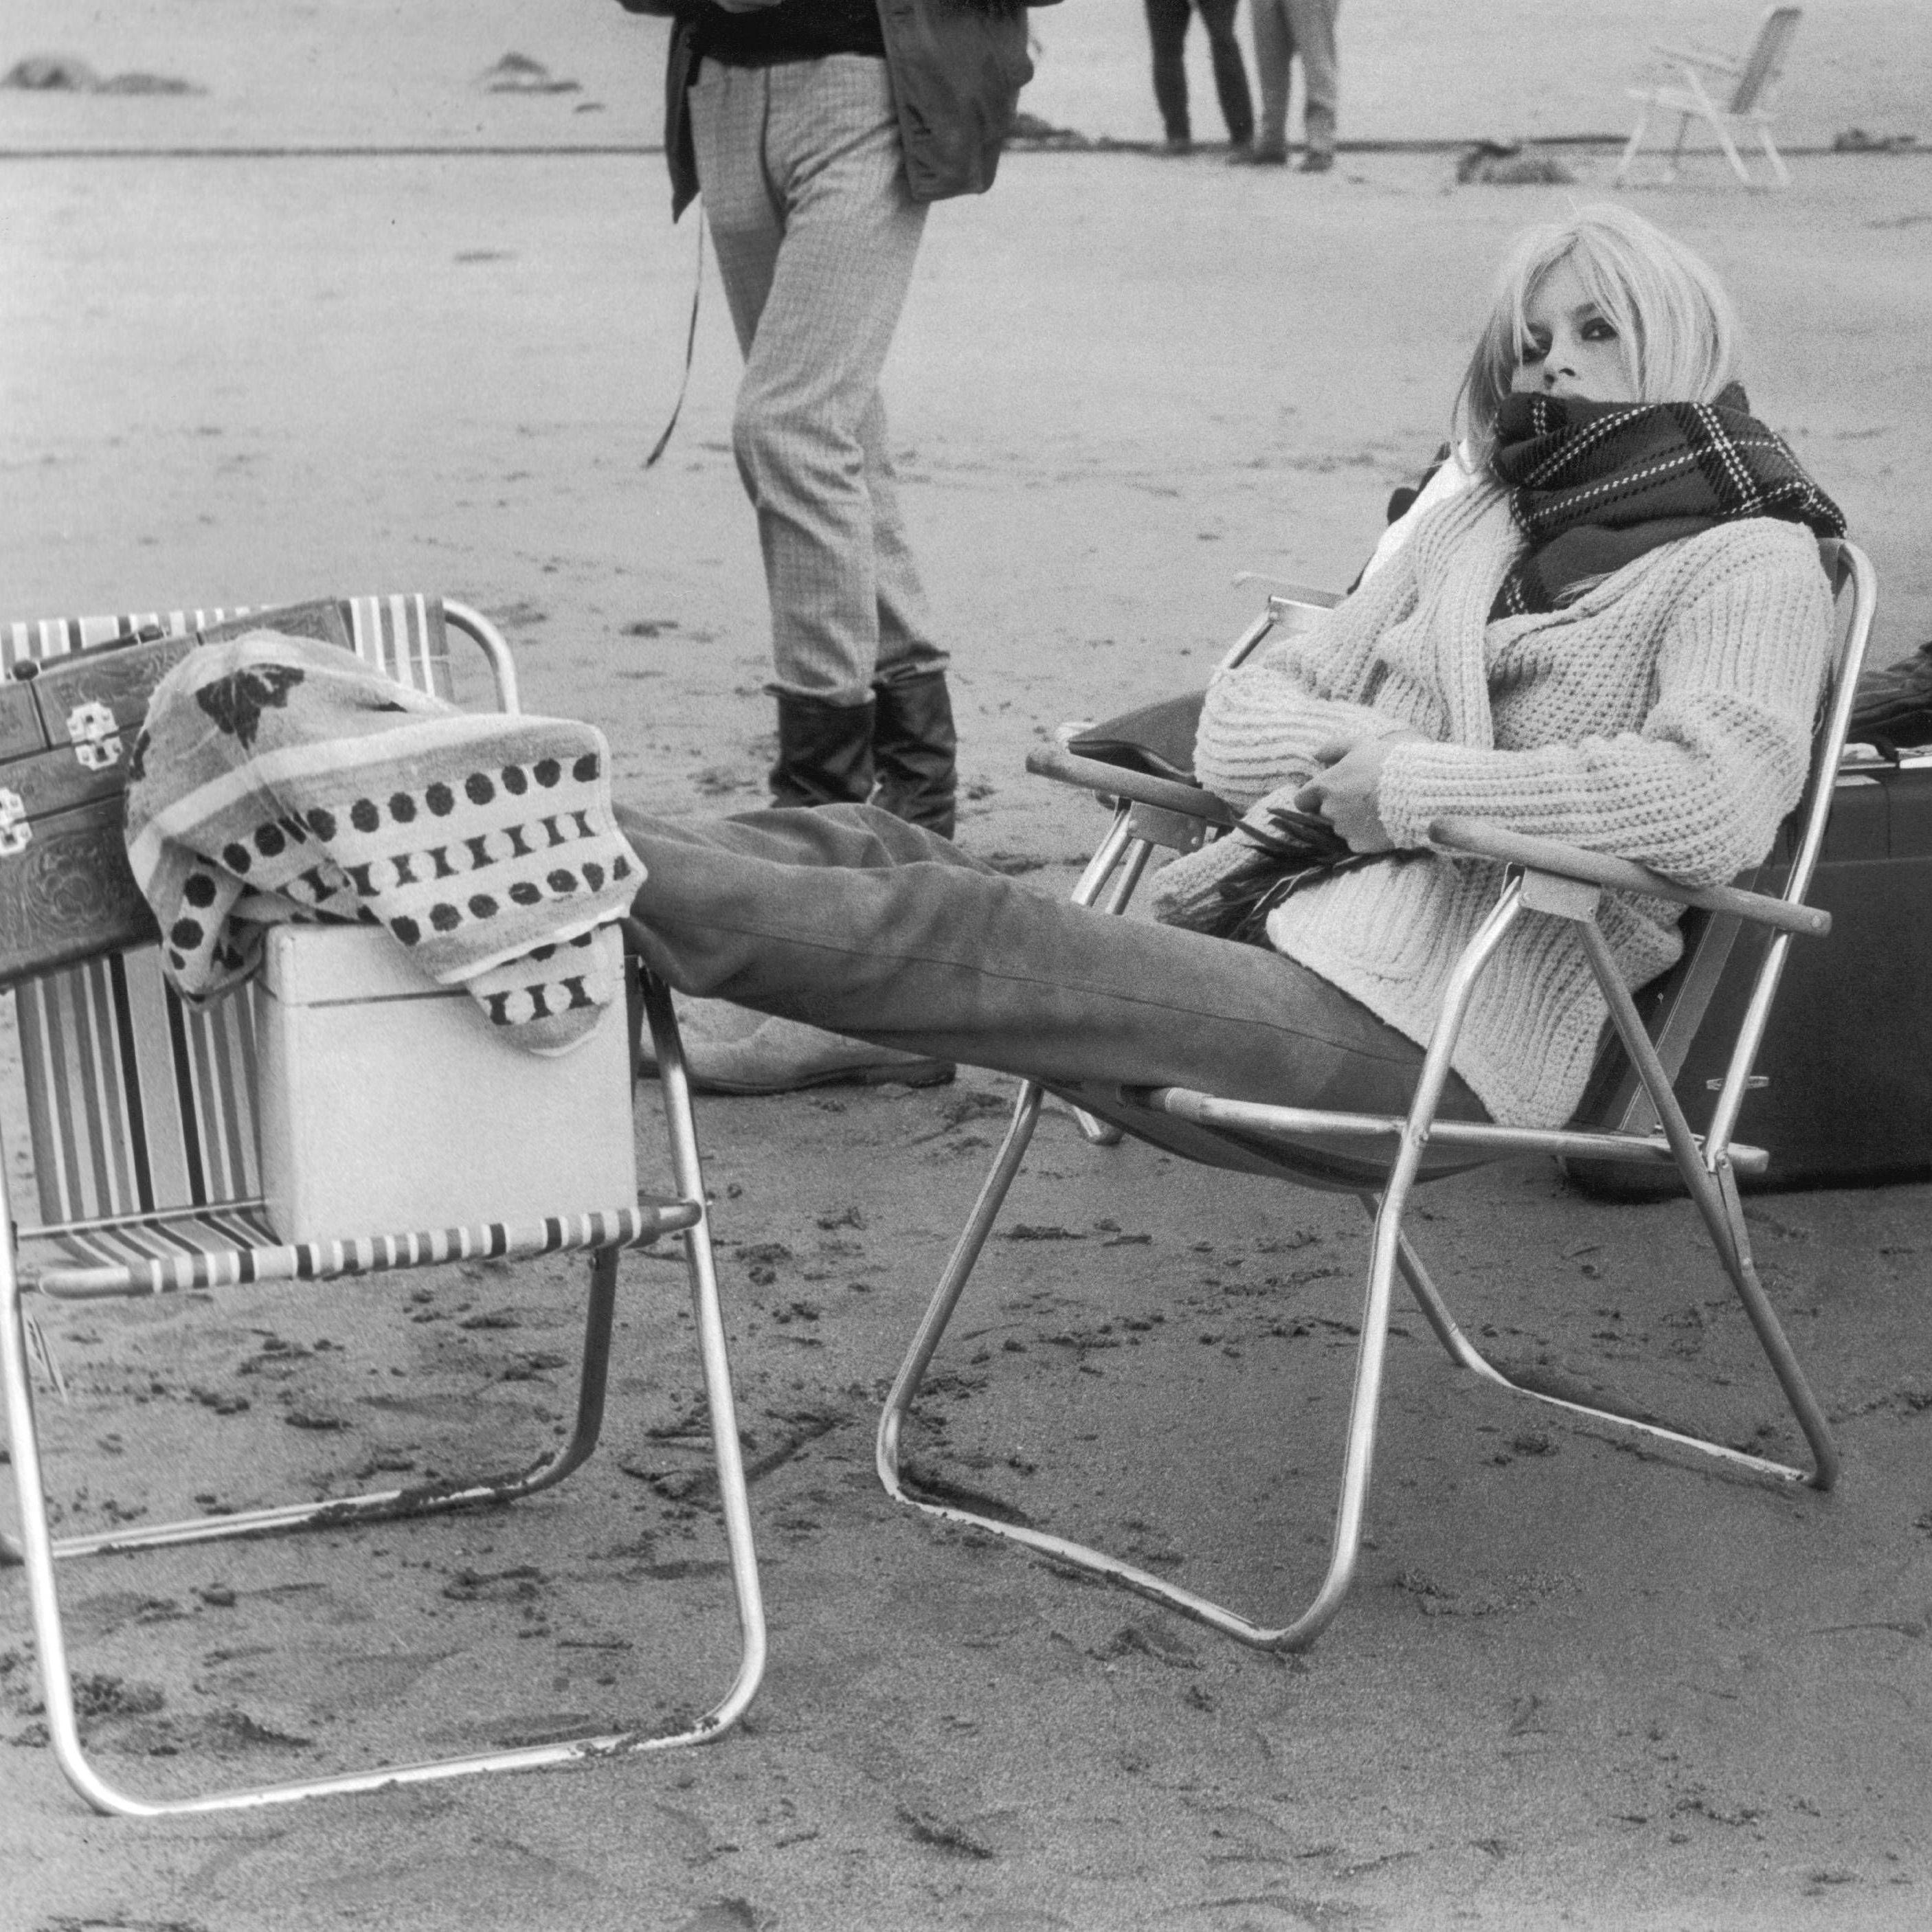 brigitte bardot during a film shooting in scotland 1966